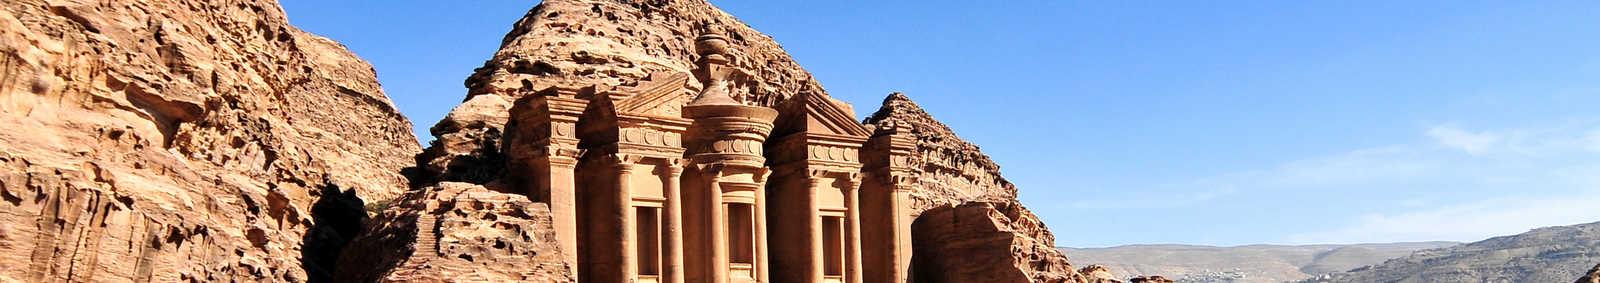 The Monastery at Petra